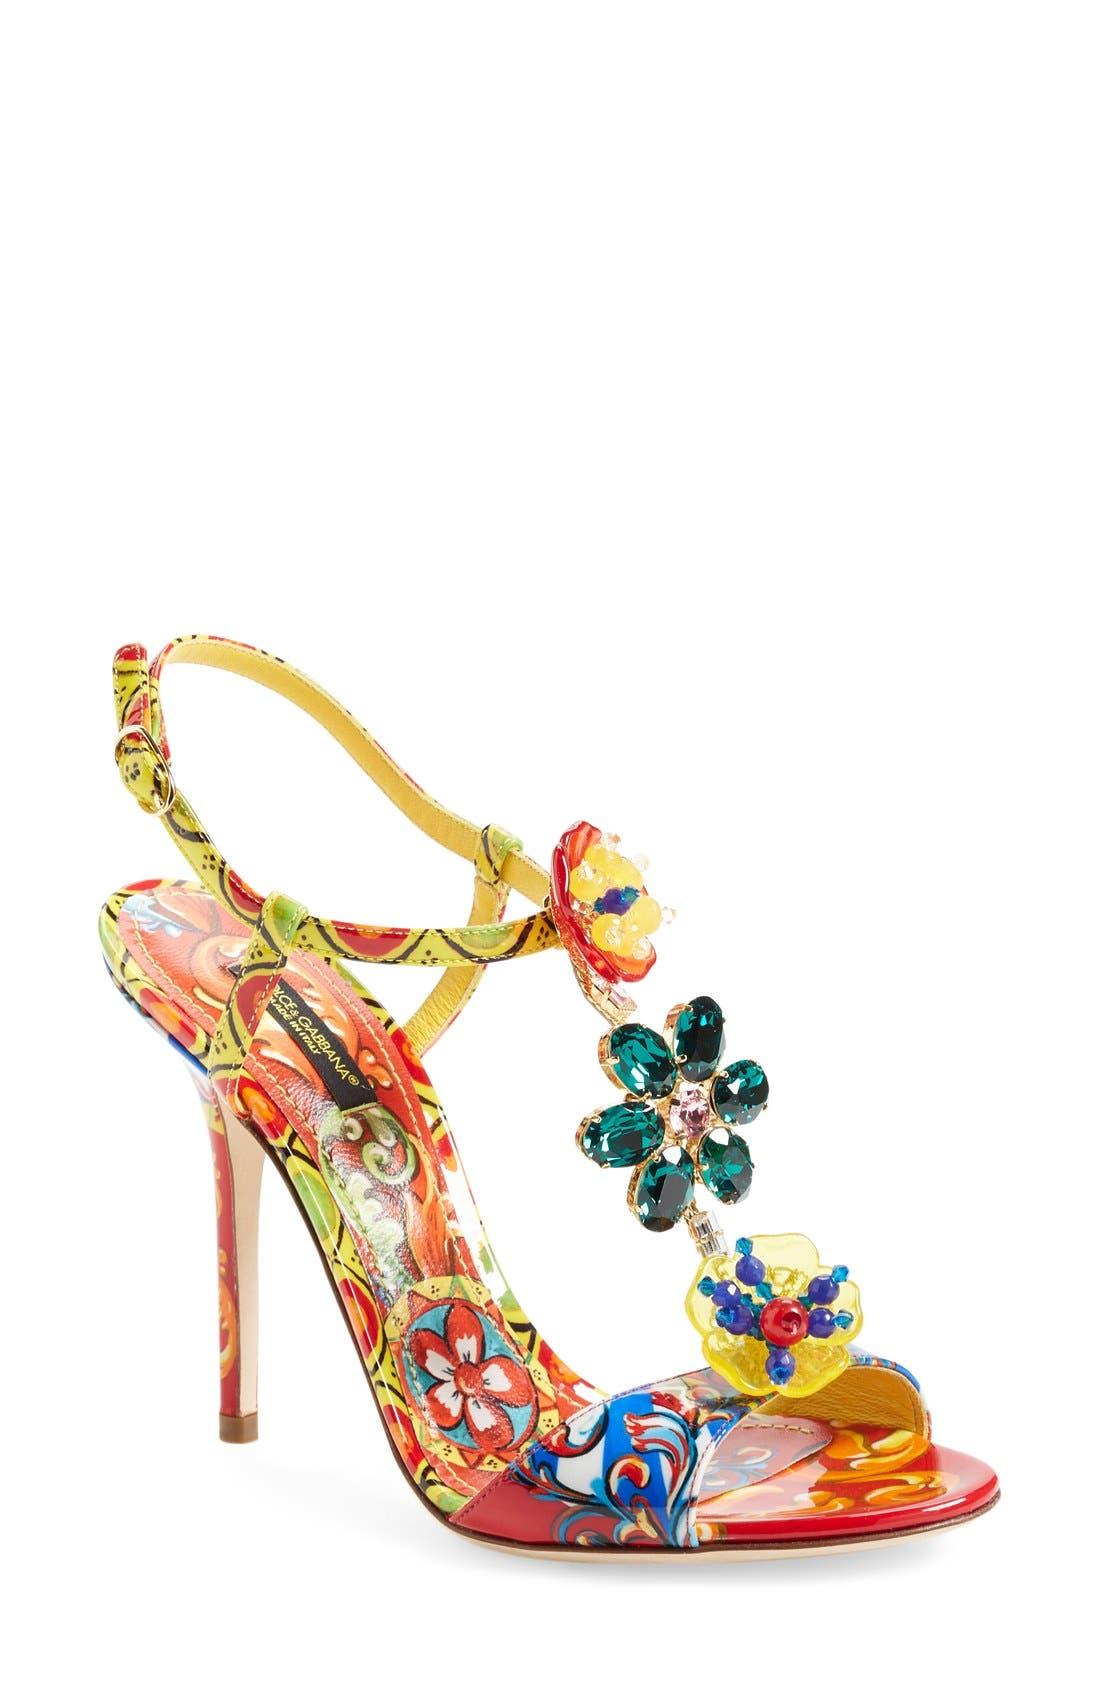 Alternate Image 1 Selected - Dolce&Gabbana Jeweled T-Strap Sandal (Women)